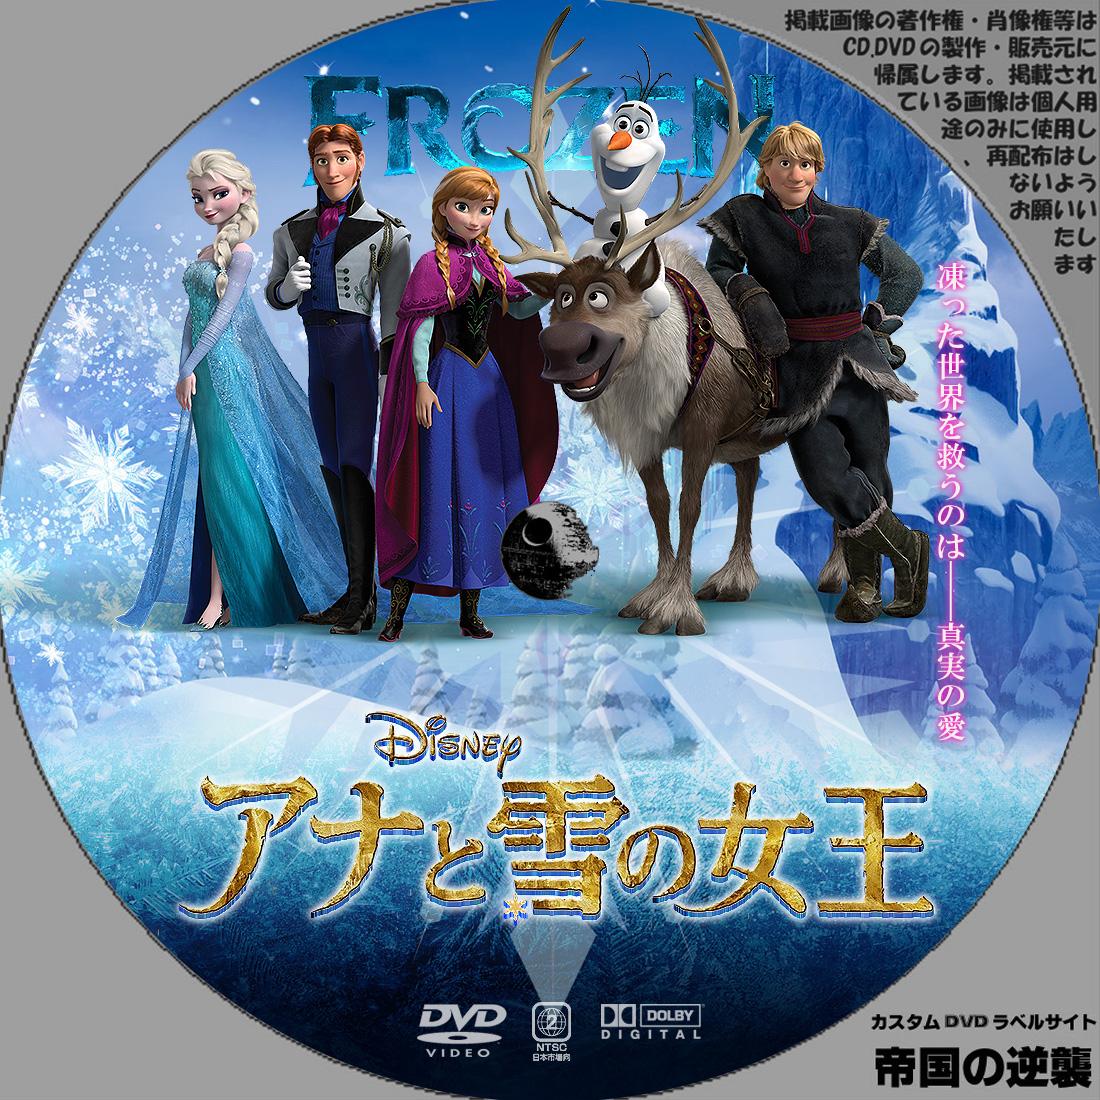 Dvd 2 アナ 雪